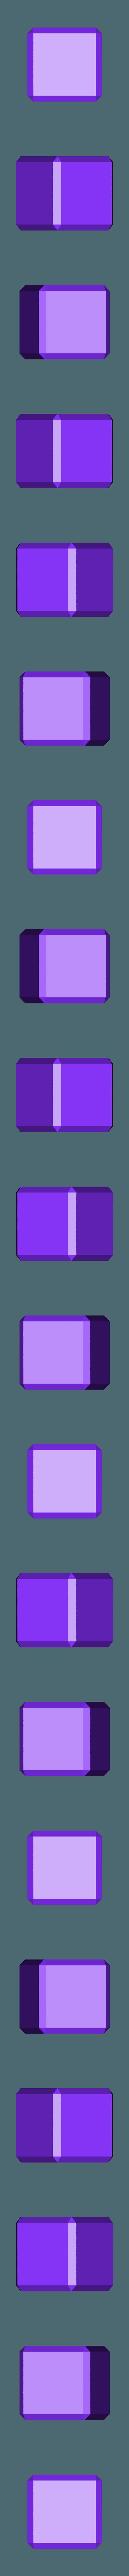 threeTop.stl Download free STL file Nesting Cubes, Recursive Cubes, Cubes within Cubes • 3D printer template, LGBU